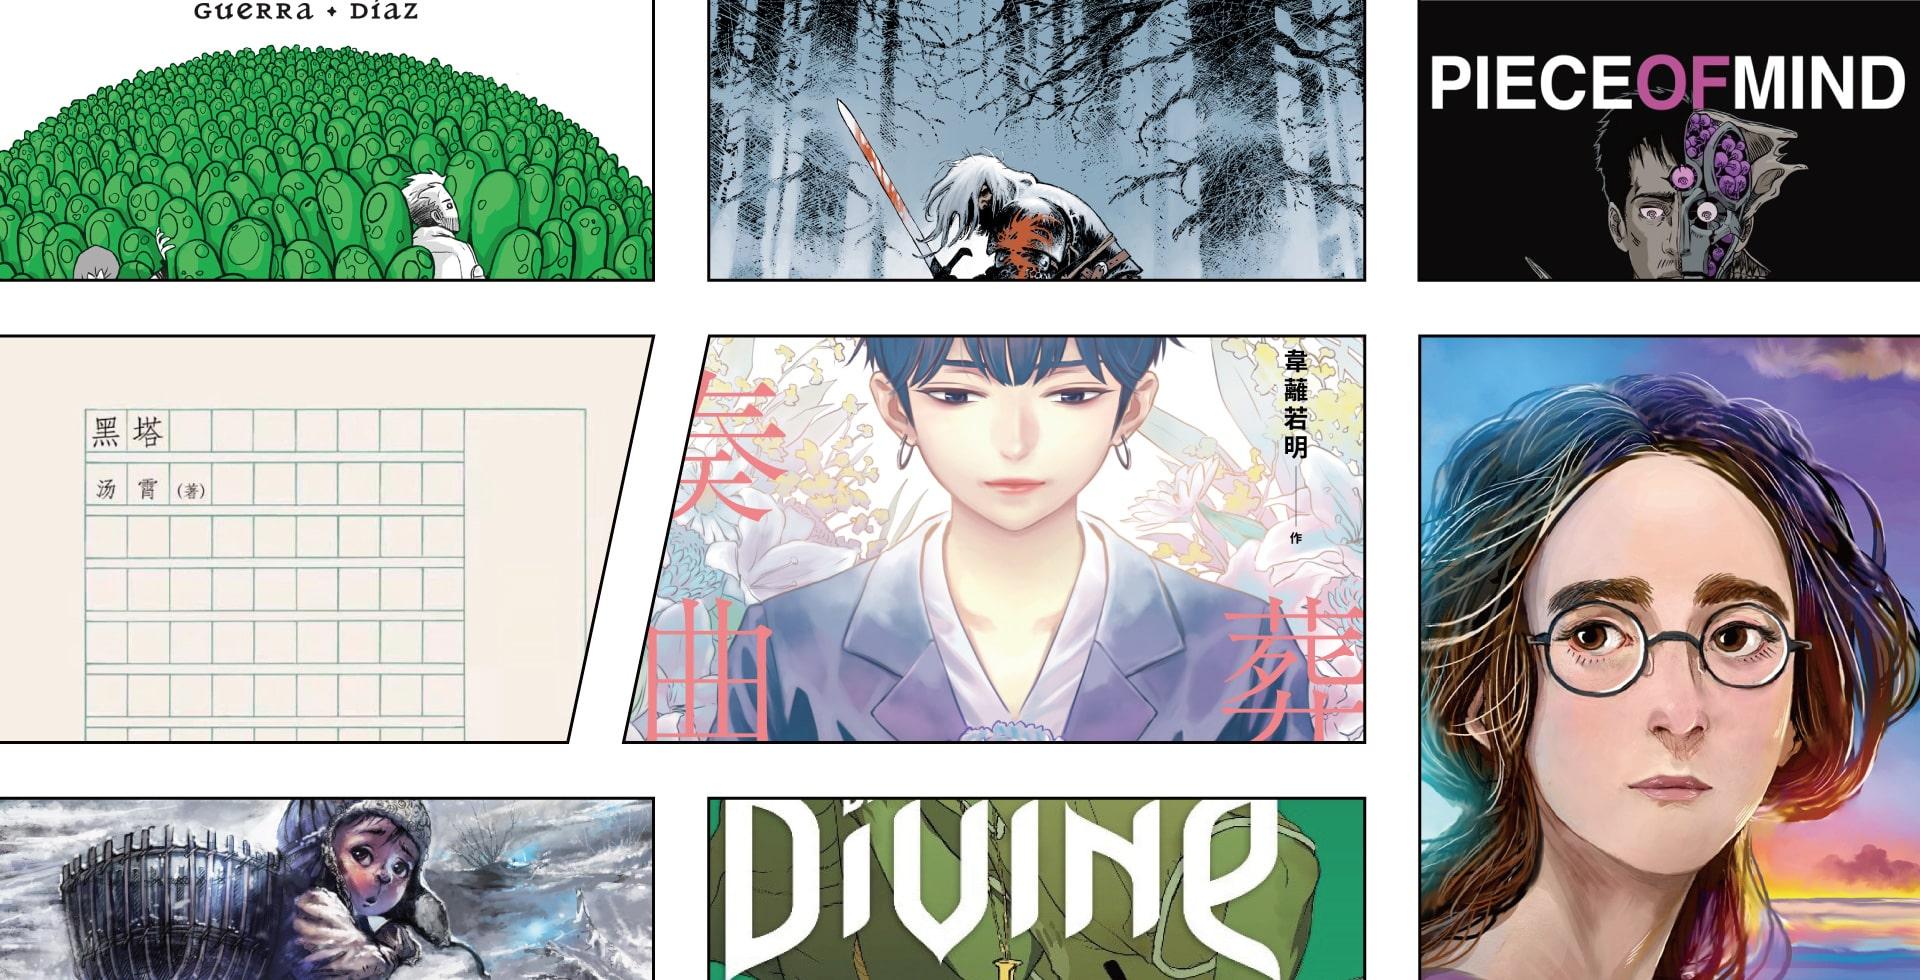 The Application for the 15th Japan International Manga Award